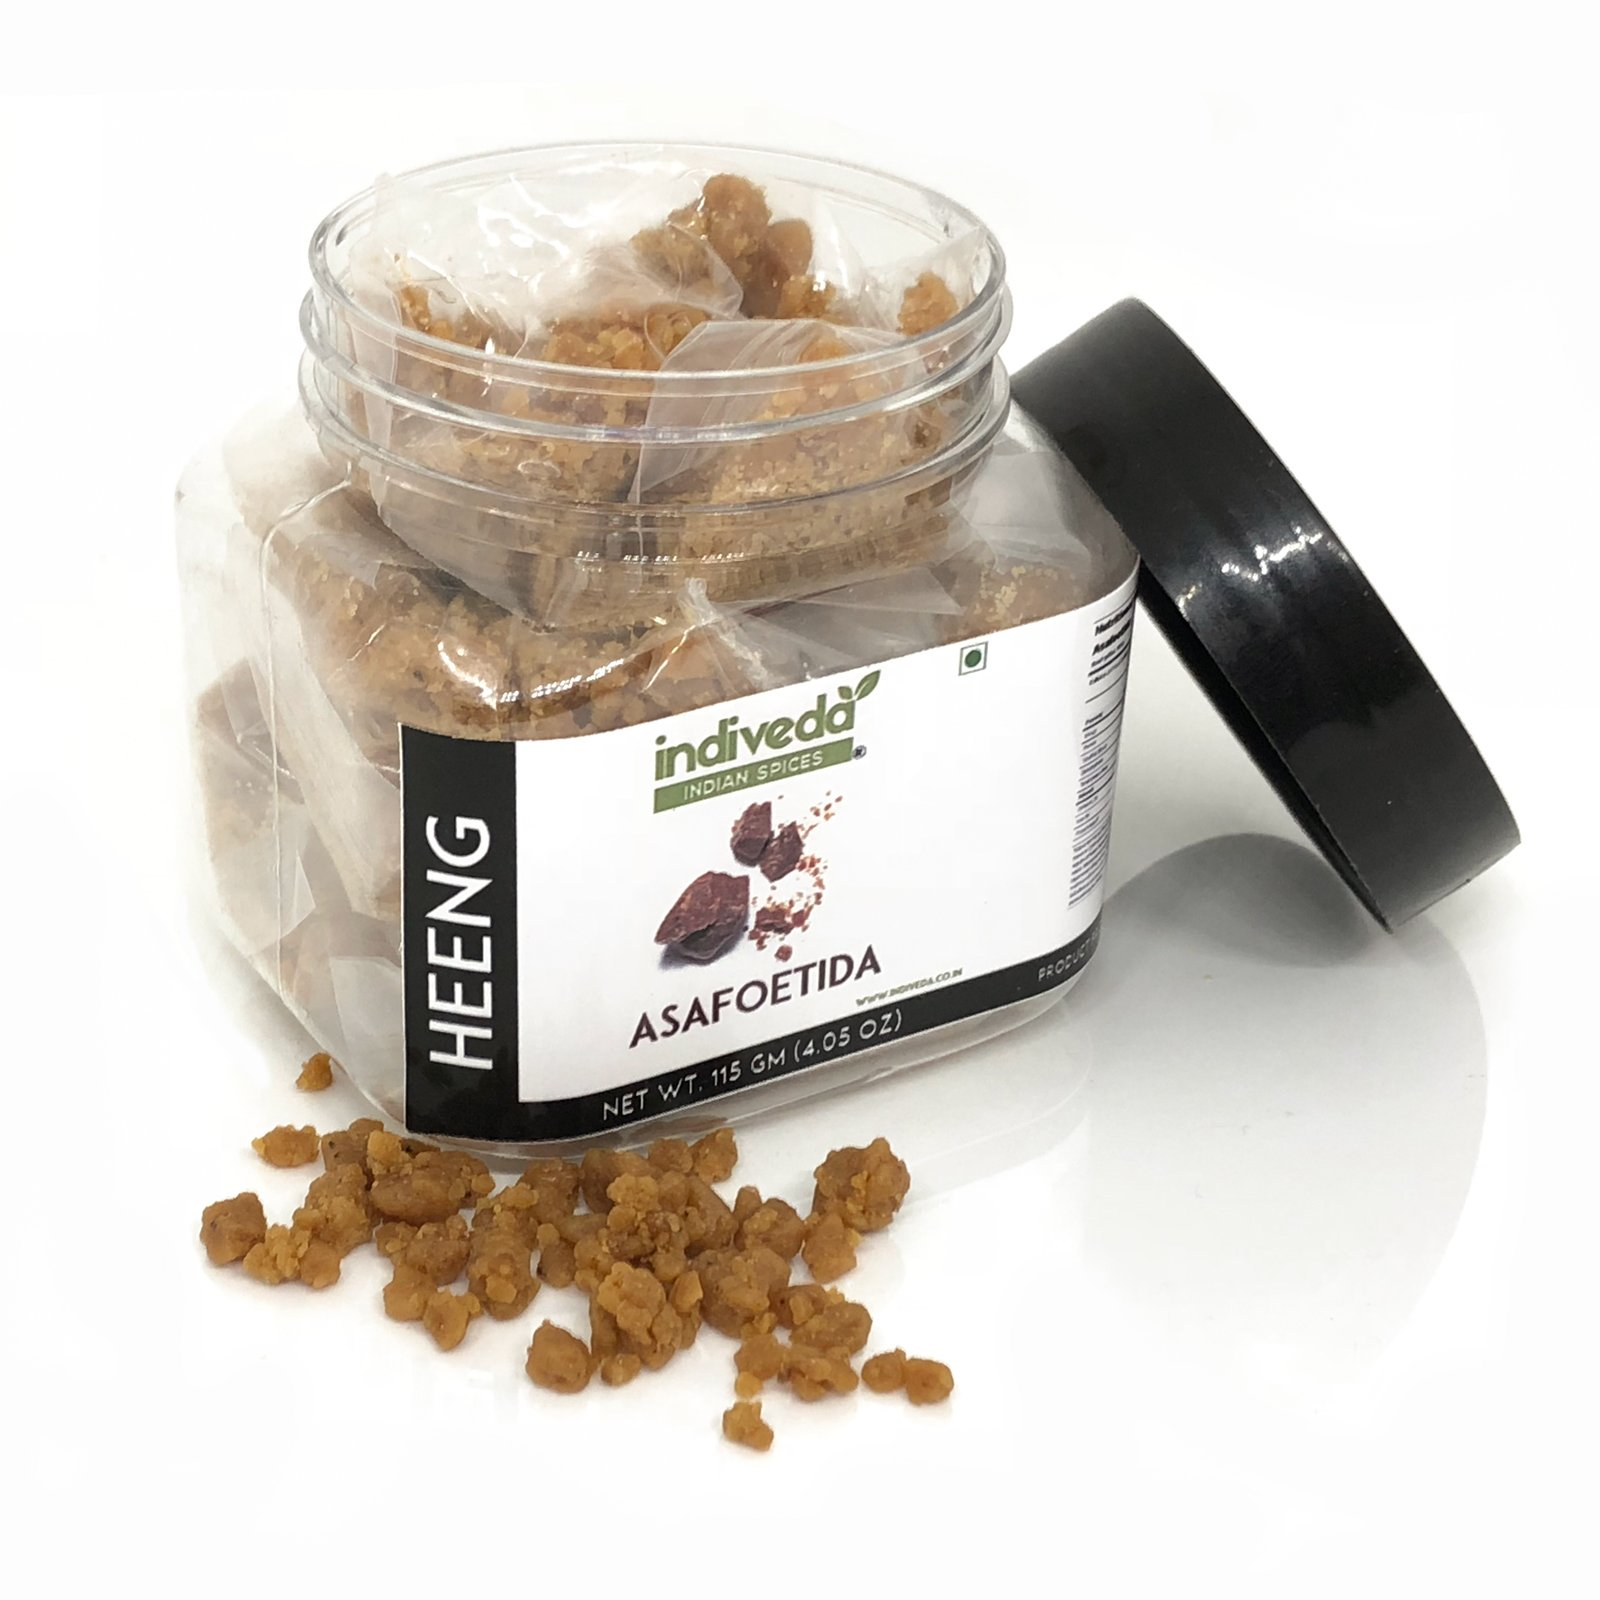 Indiveda Whole Asafoetida (Heeng) - Strong Aroma Indian Seasoning Spice, 115gm (4.05oz))